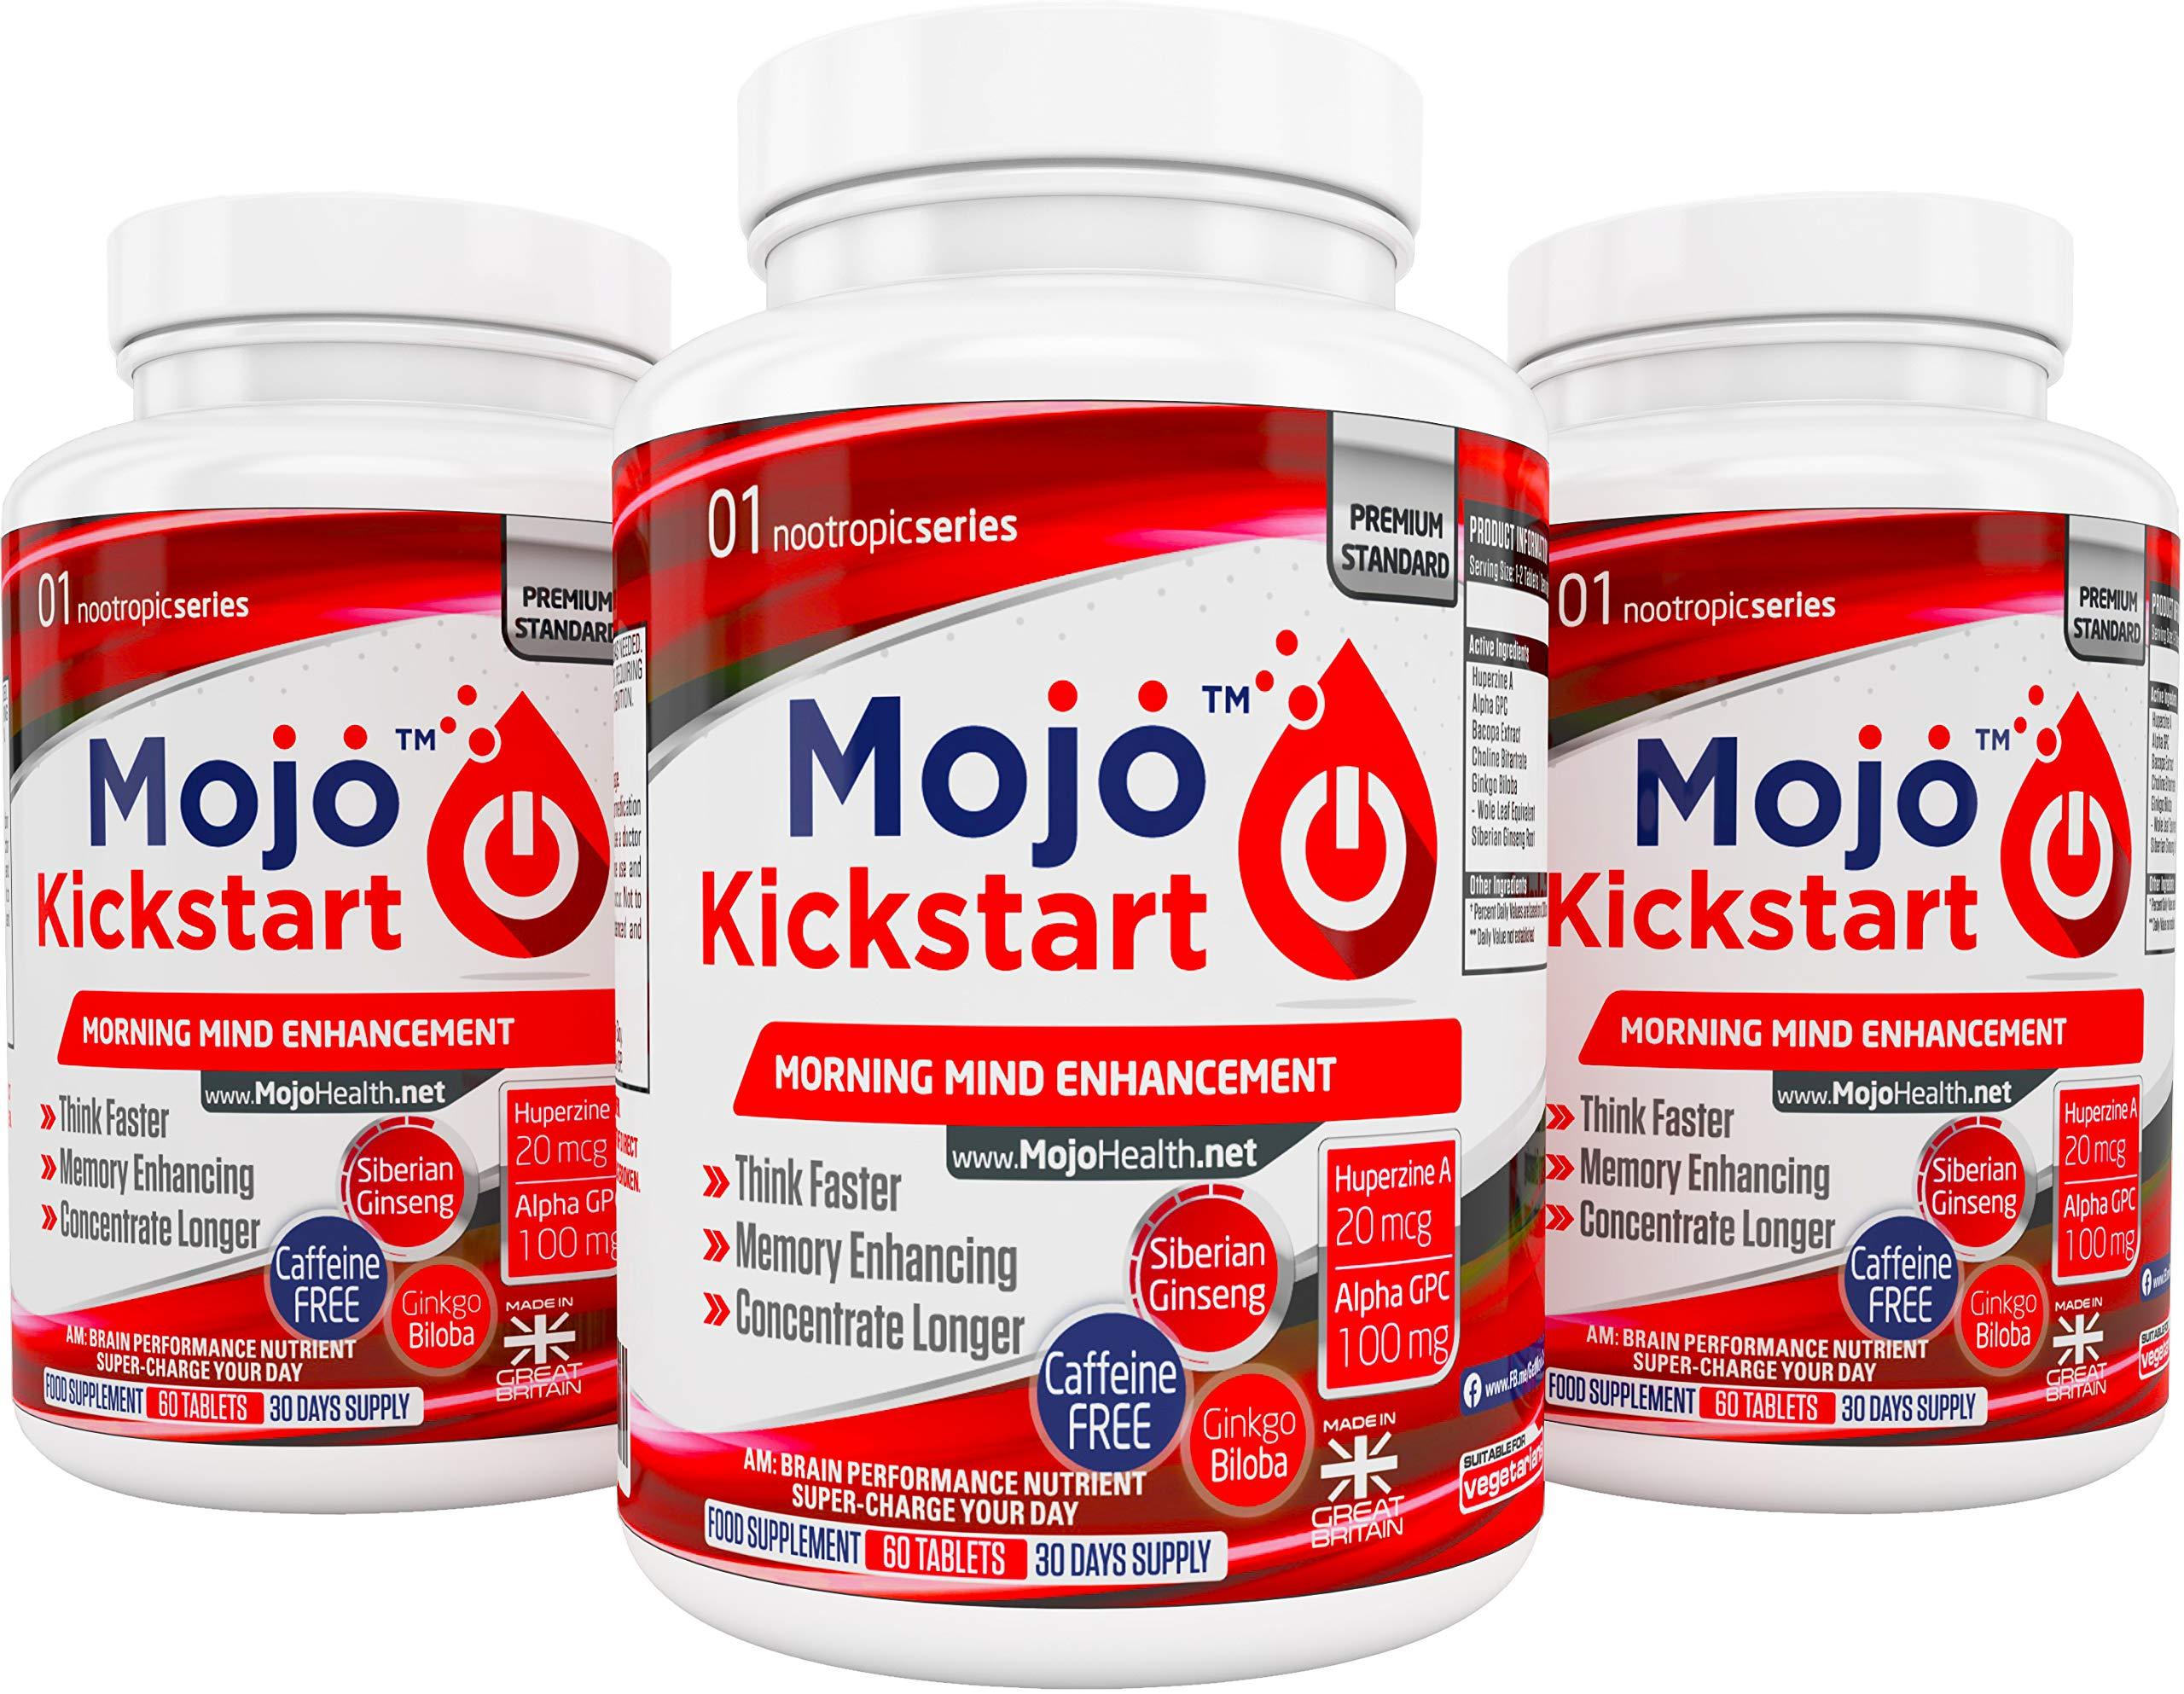 MOJO KICKSTART - Nootropic Alpha Brain Wave Boost Mental Supplements Focus Nootropics Enhancement   Alpha GPC   Bacopa   Choline   L-Tyrosine   Ginkgo Biloba   CoQ10   Ginseng + MONEY BACK GUARANTEE